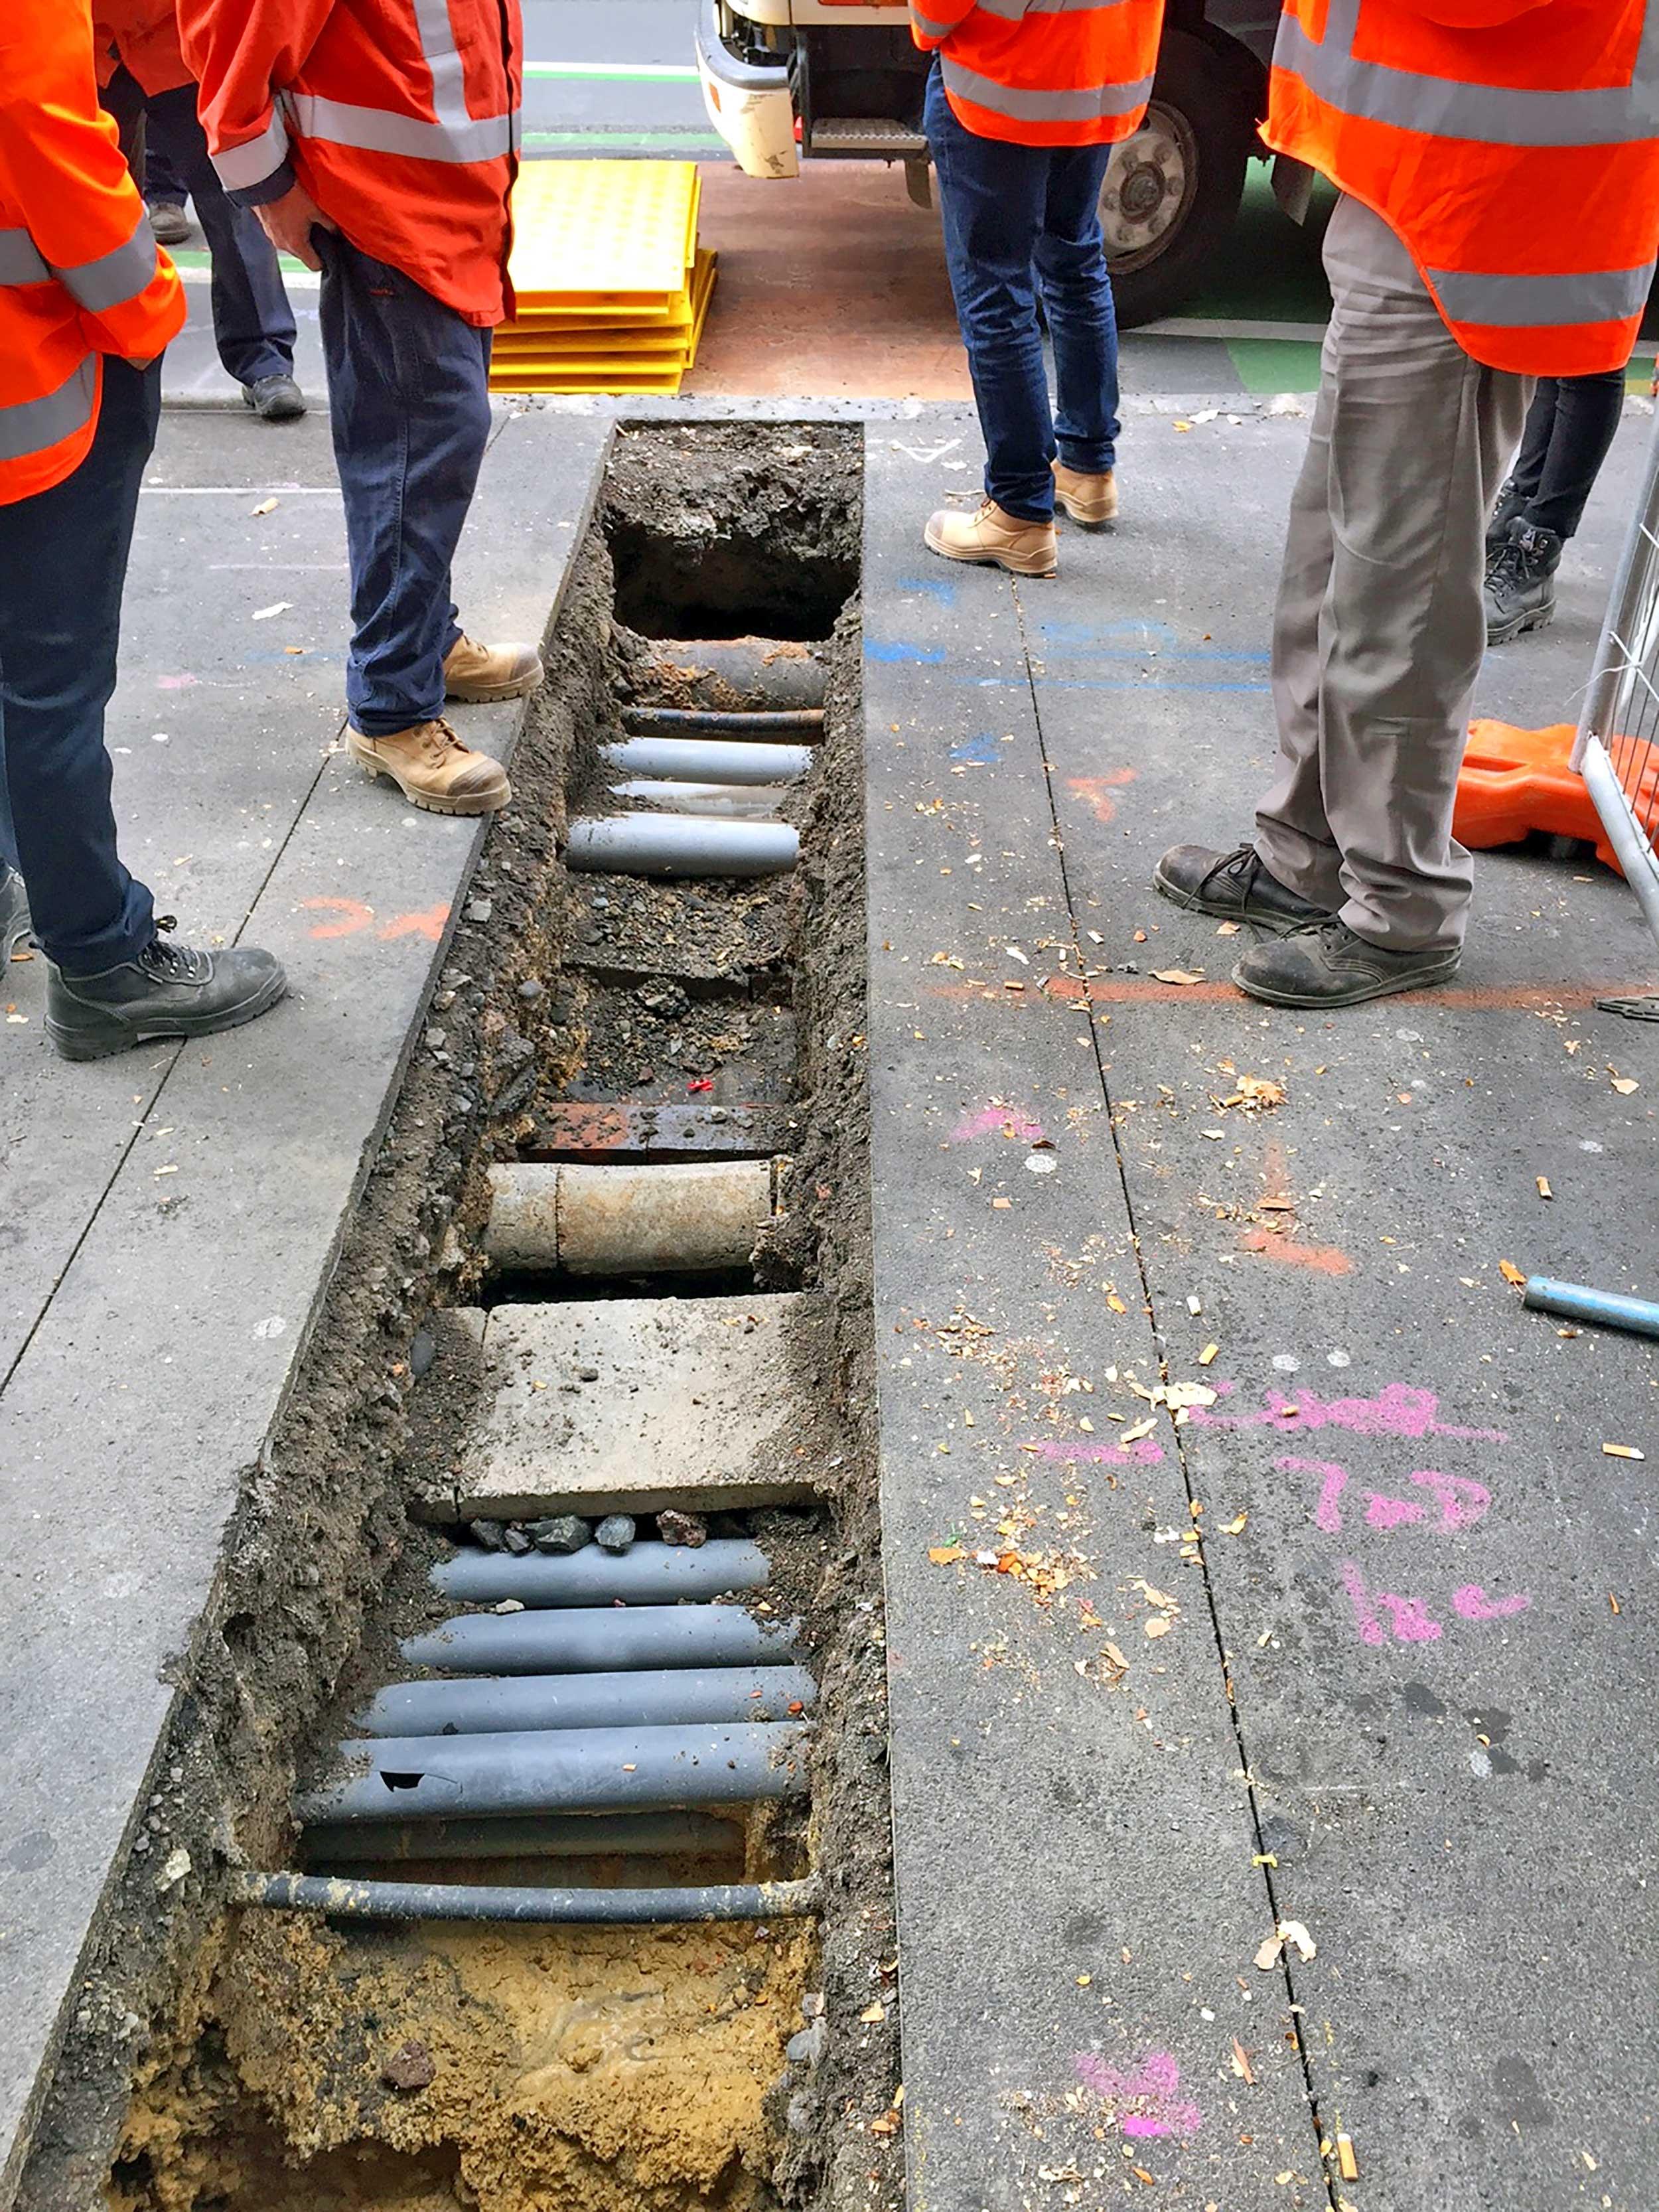 Checking what utilities are underground